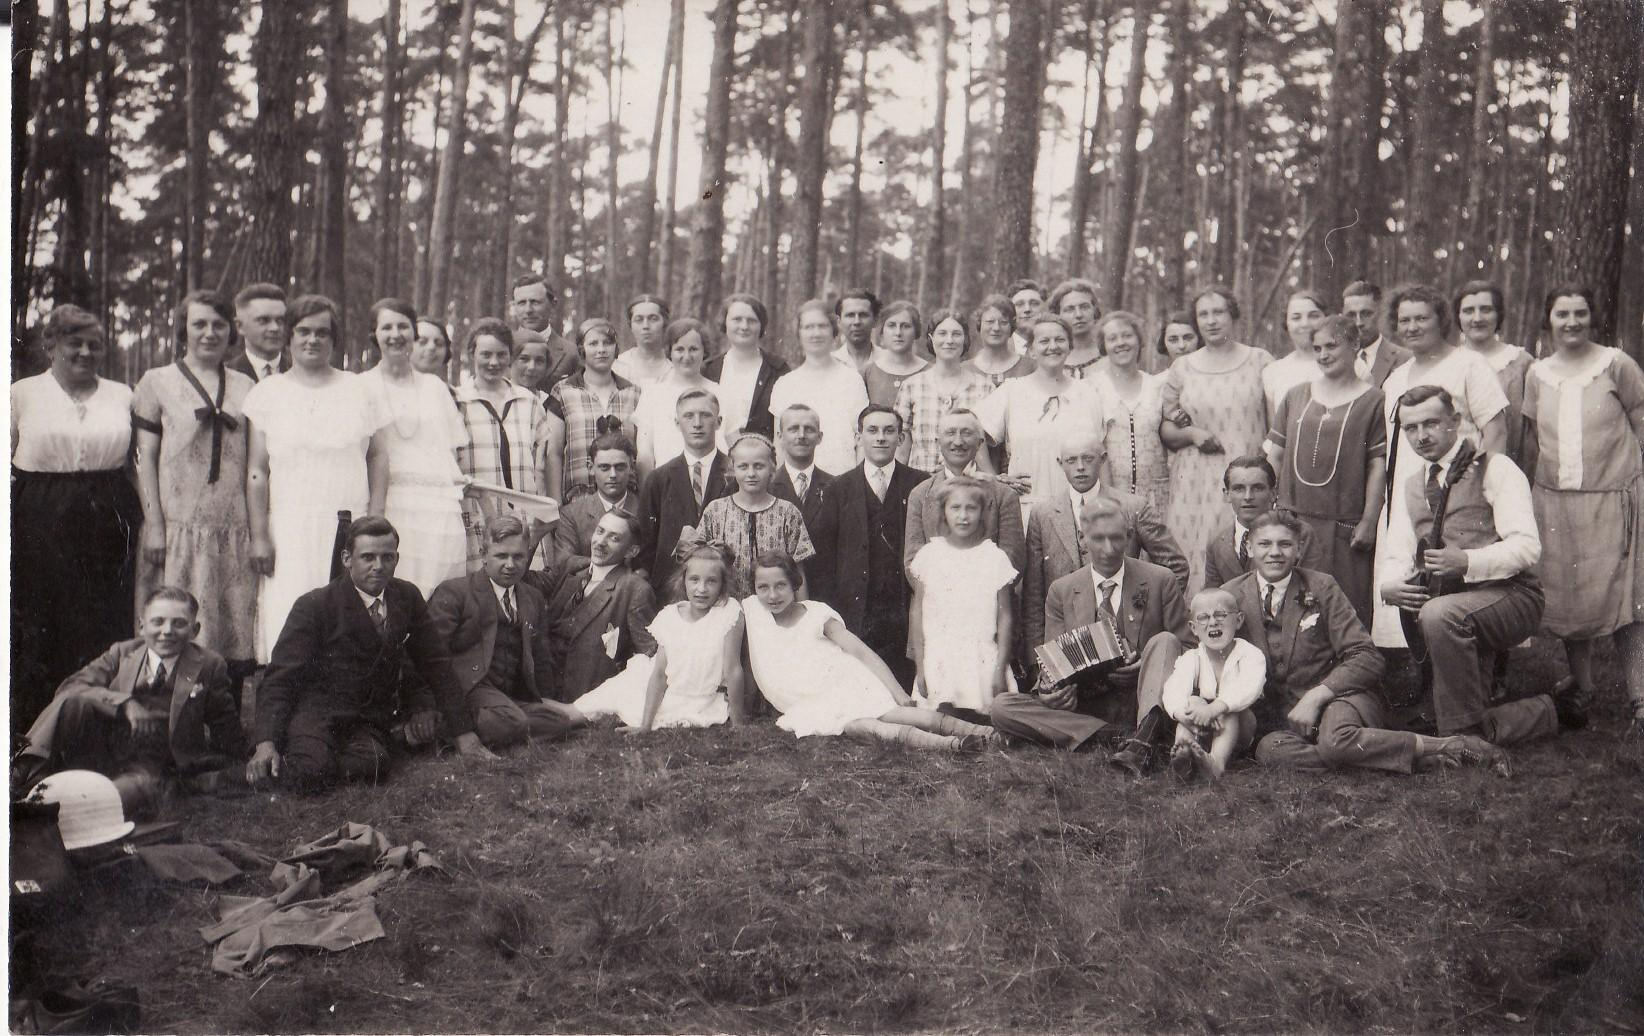 Gem. Chor Eintracht gegründet 1905